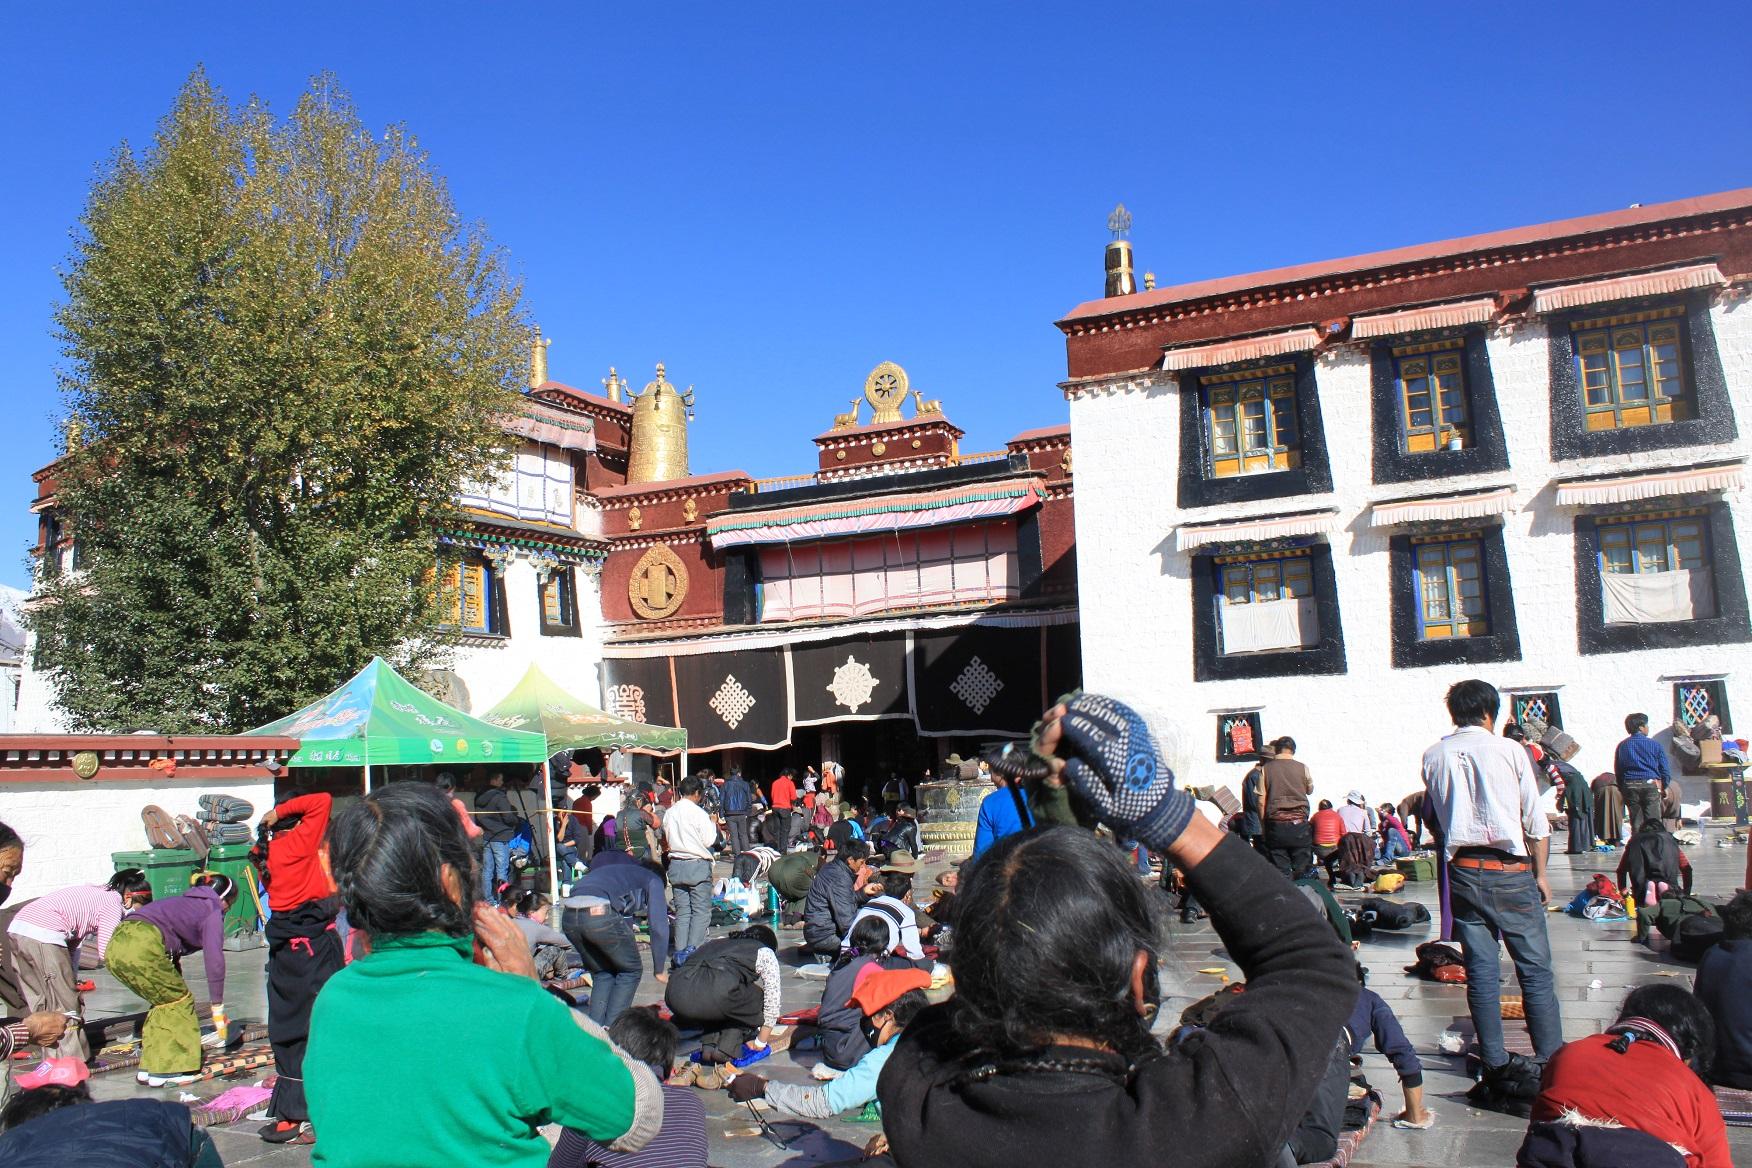 Tibetan Pilgrims at Jokhang Temple